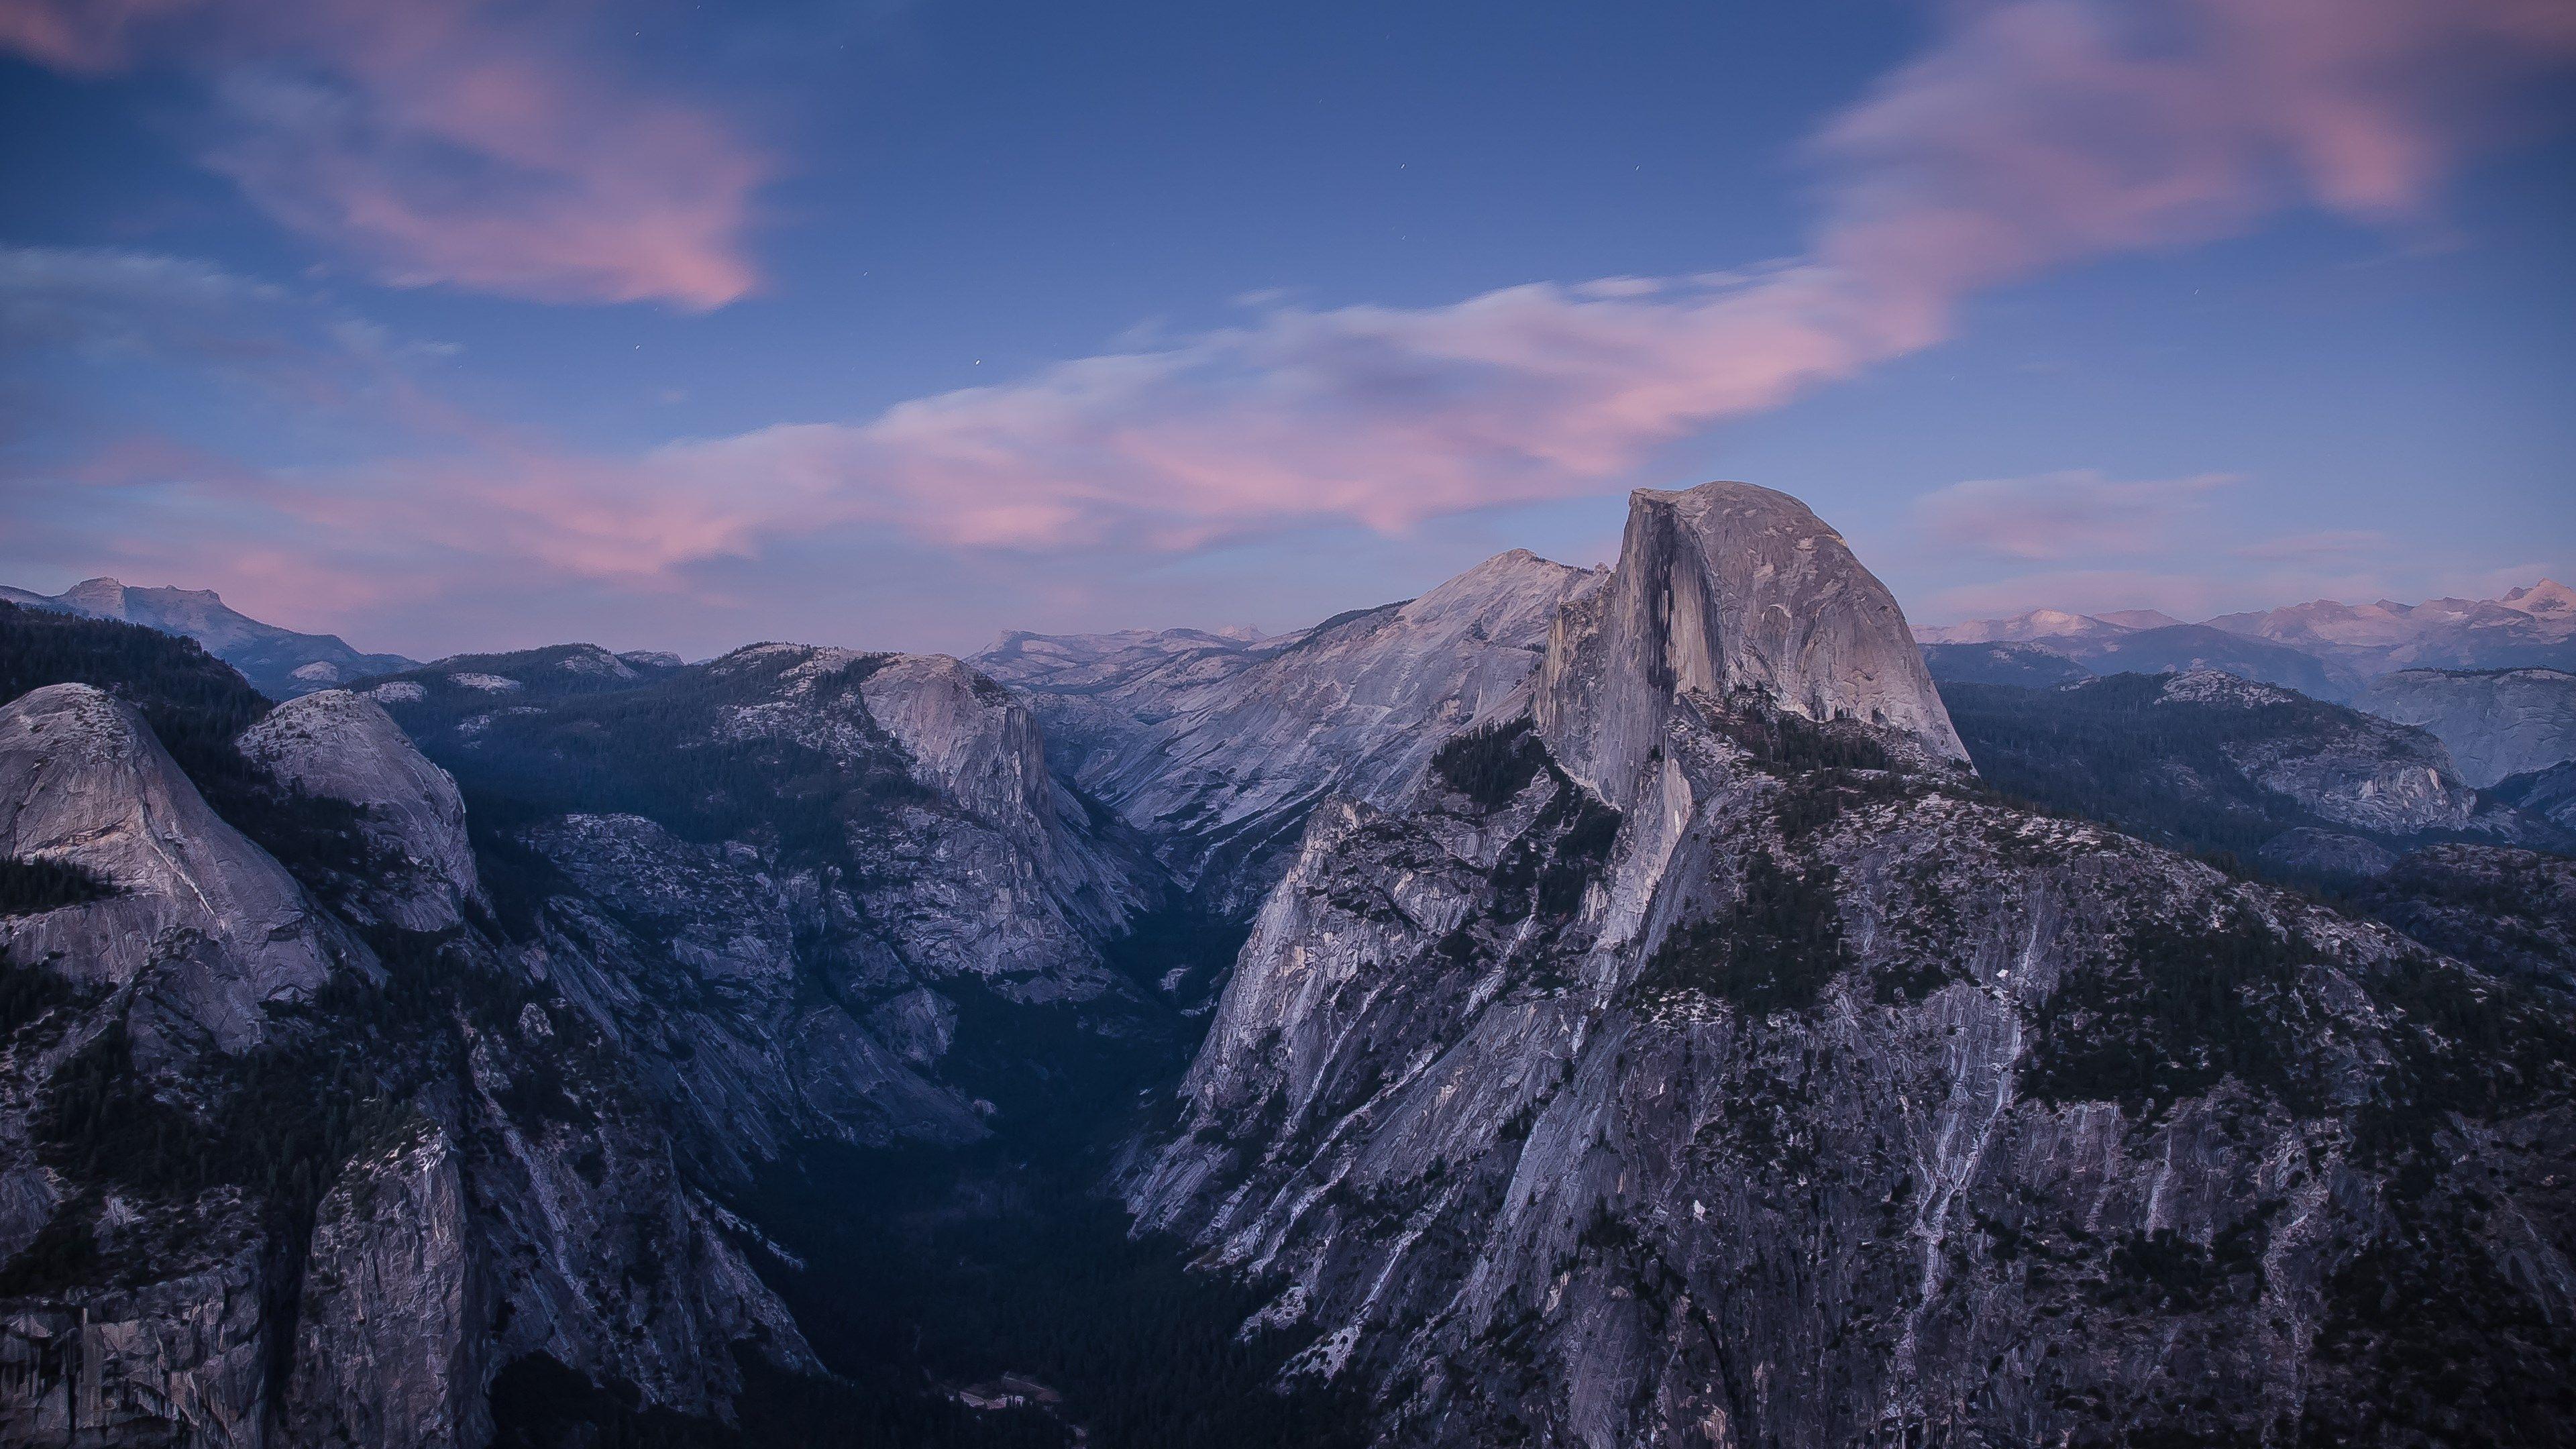 4k Download Hd Wallpaper For Pc 3840x2160 Yosemite Wallpaper Nature Wallpaper Yosemite